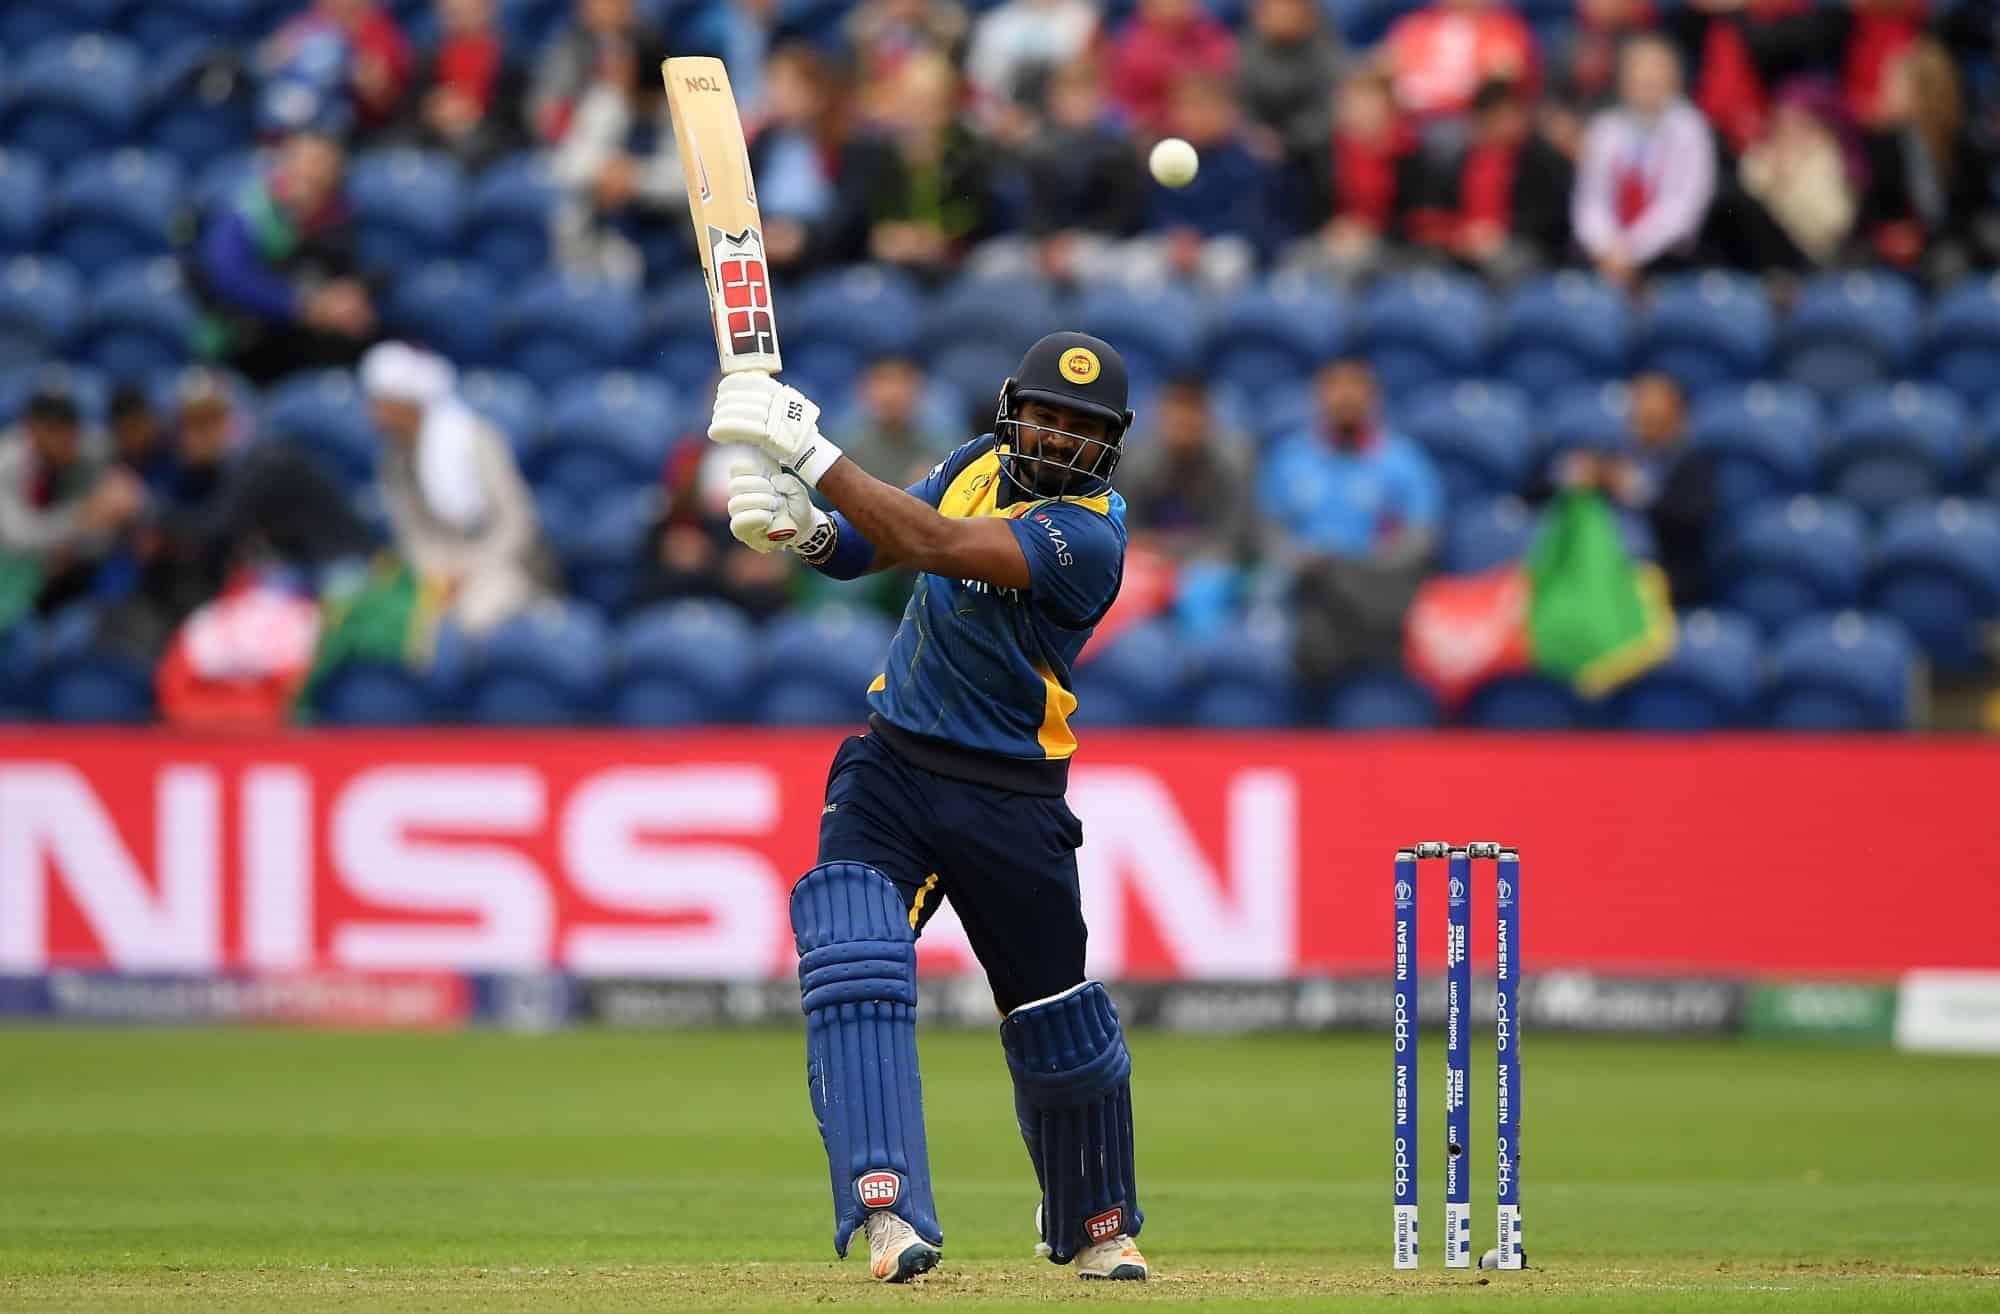 Kusal Perera Replaced Dimuth Karunaratne As ODI Captain of Sri Lanka